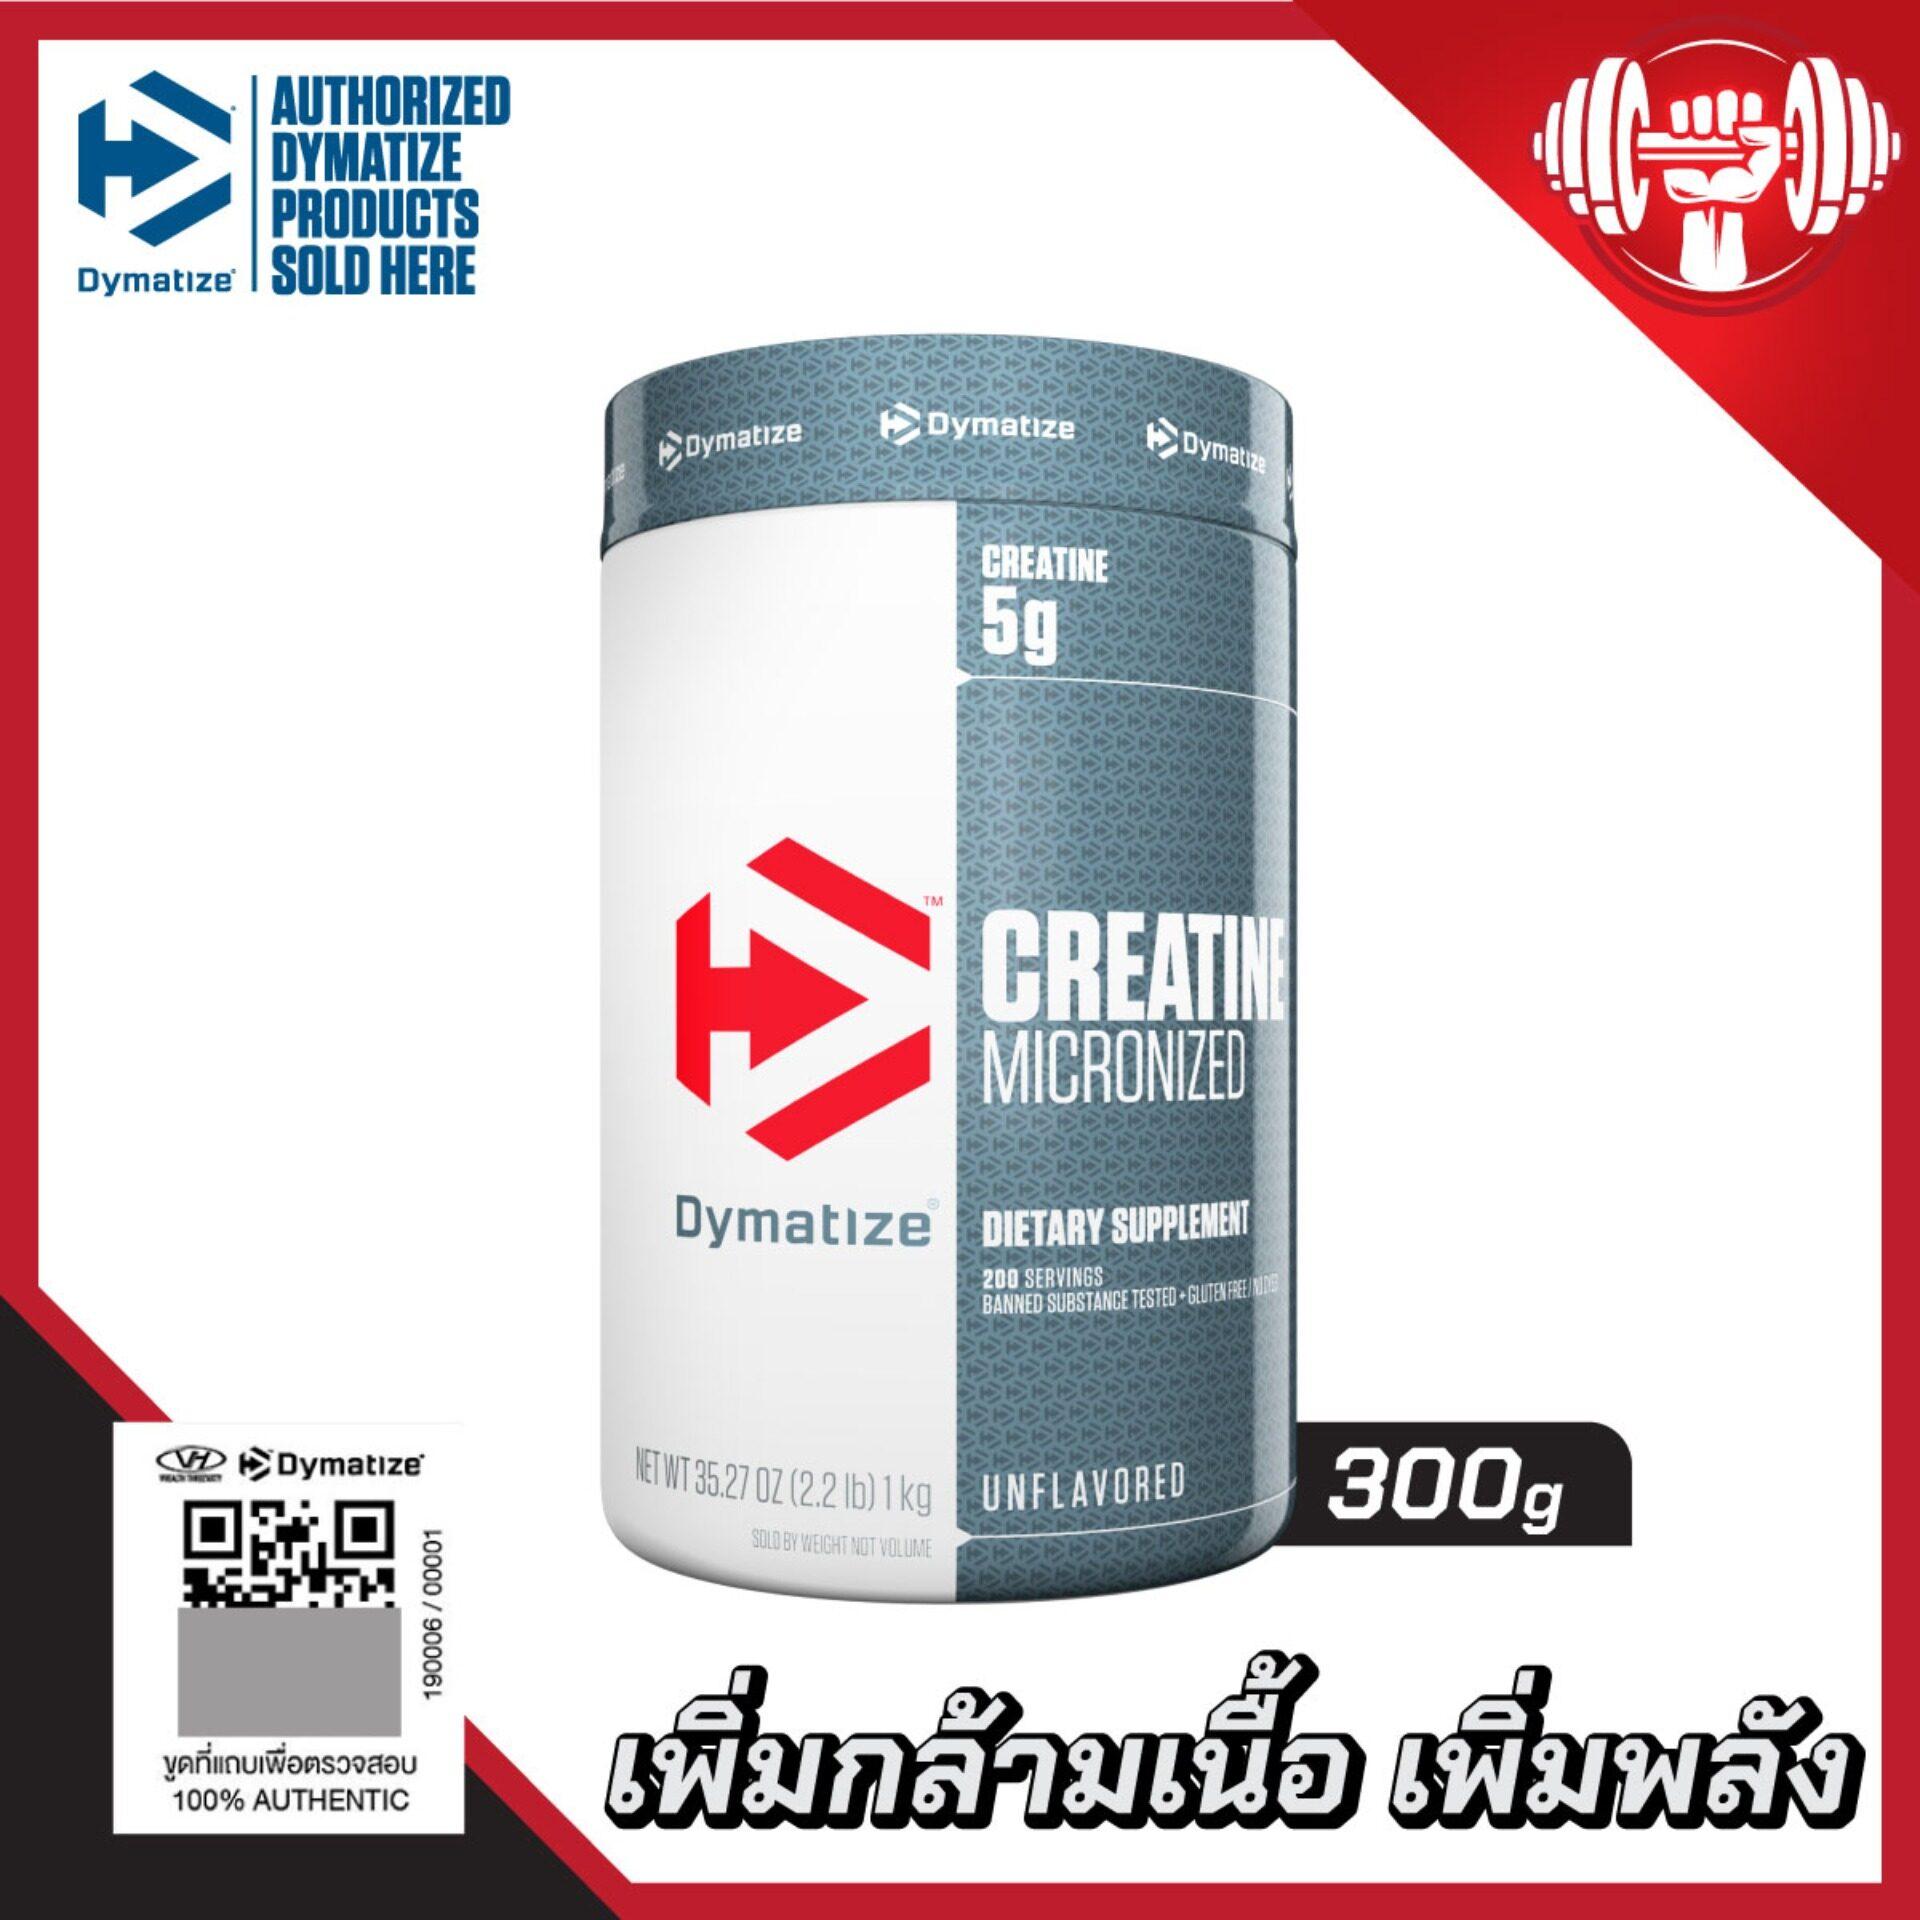 Dymatize Creatine Micronized 60 servings